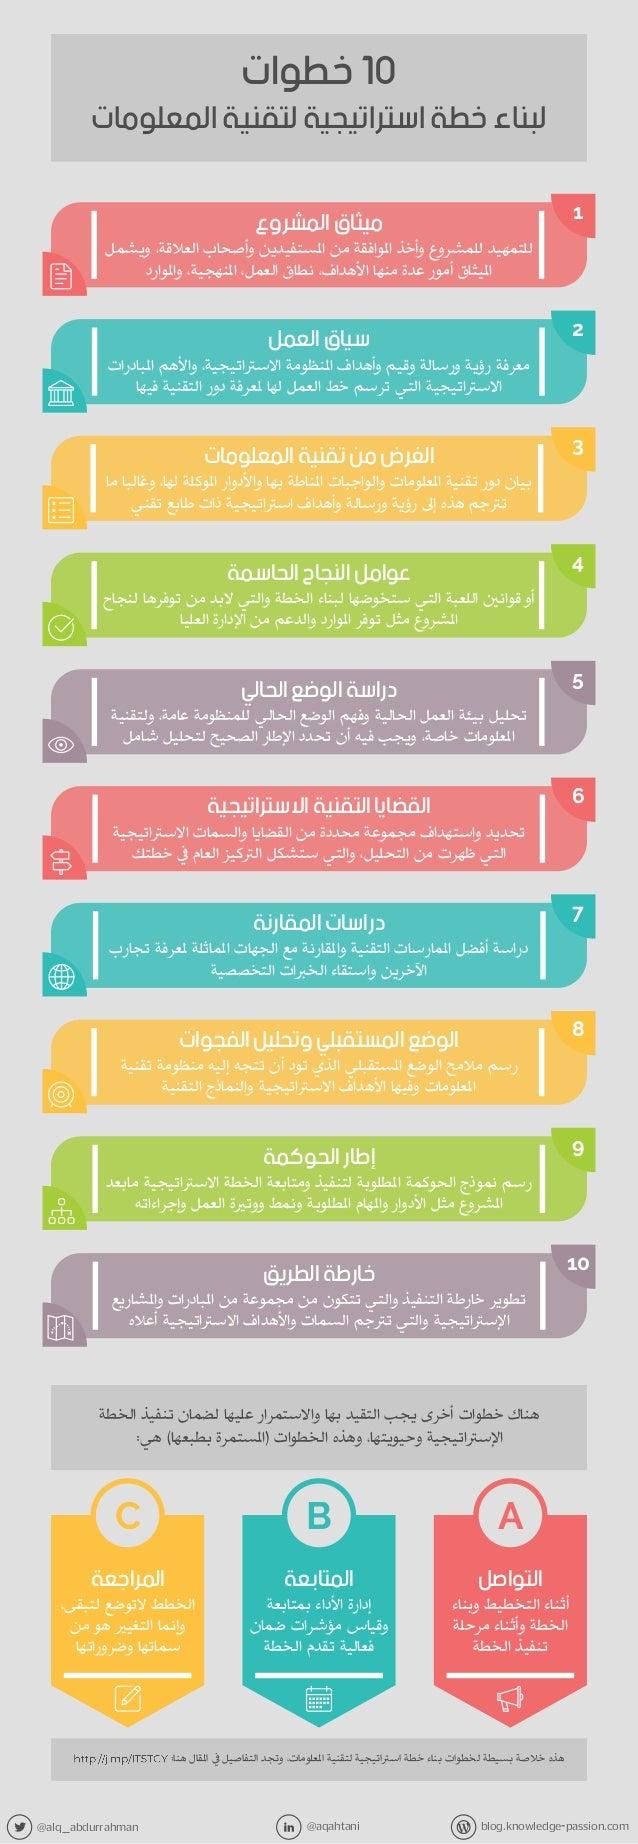 @alq_abdurrahman @aqahtani blog.knowledge-passion.com 1 10 2 3 4 5 6 7 8 9 ABC ميثاقالمشروع و ،العالقة وأصحاب ا...